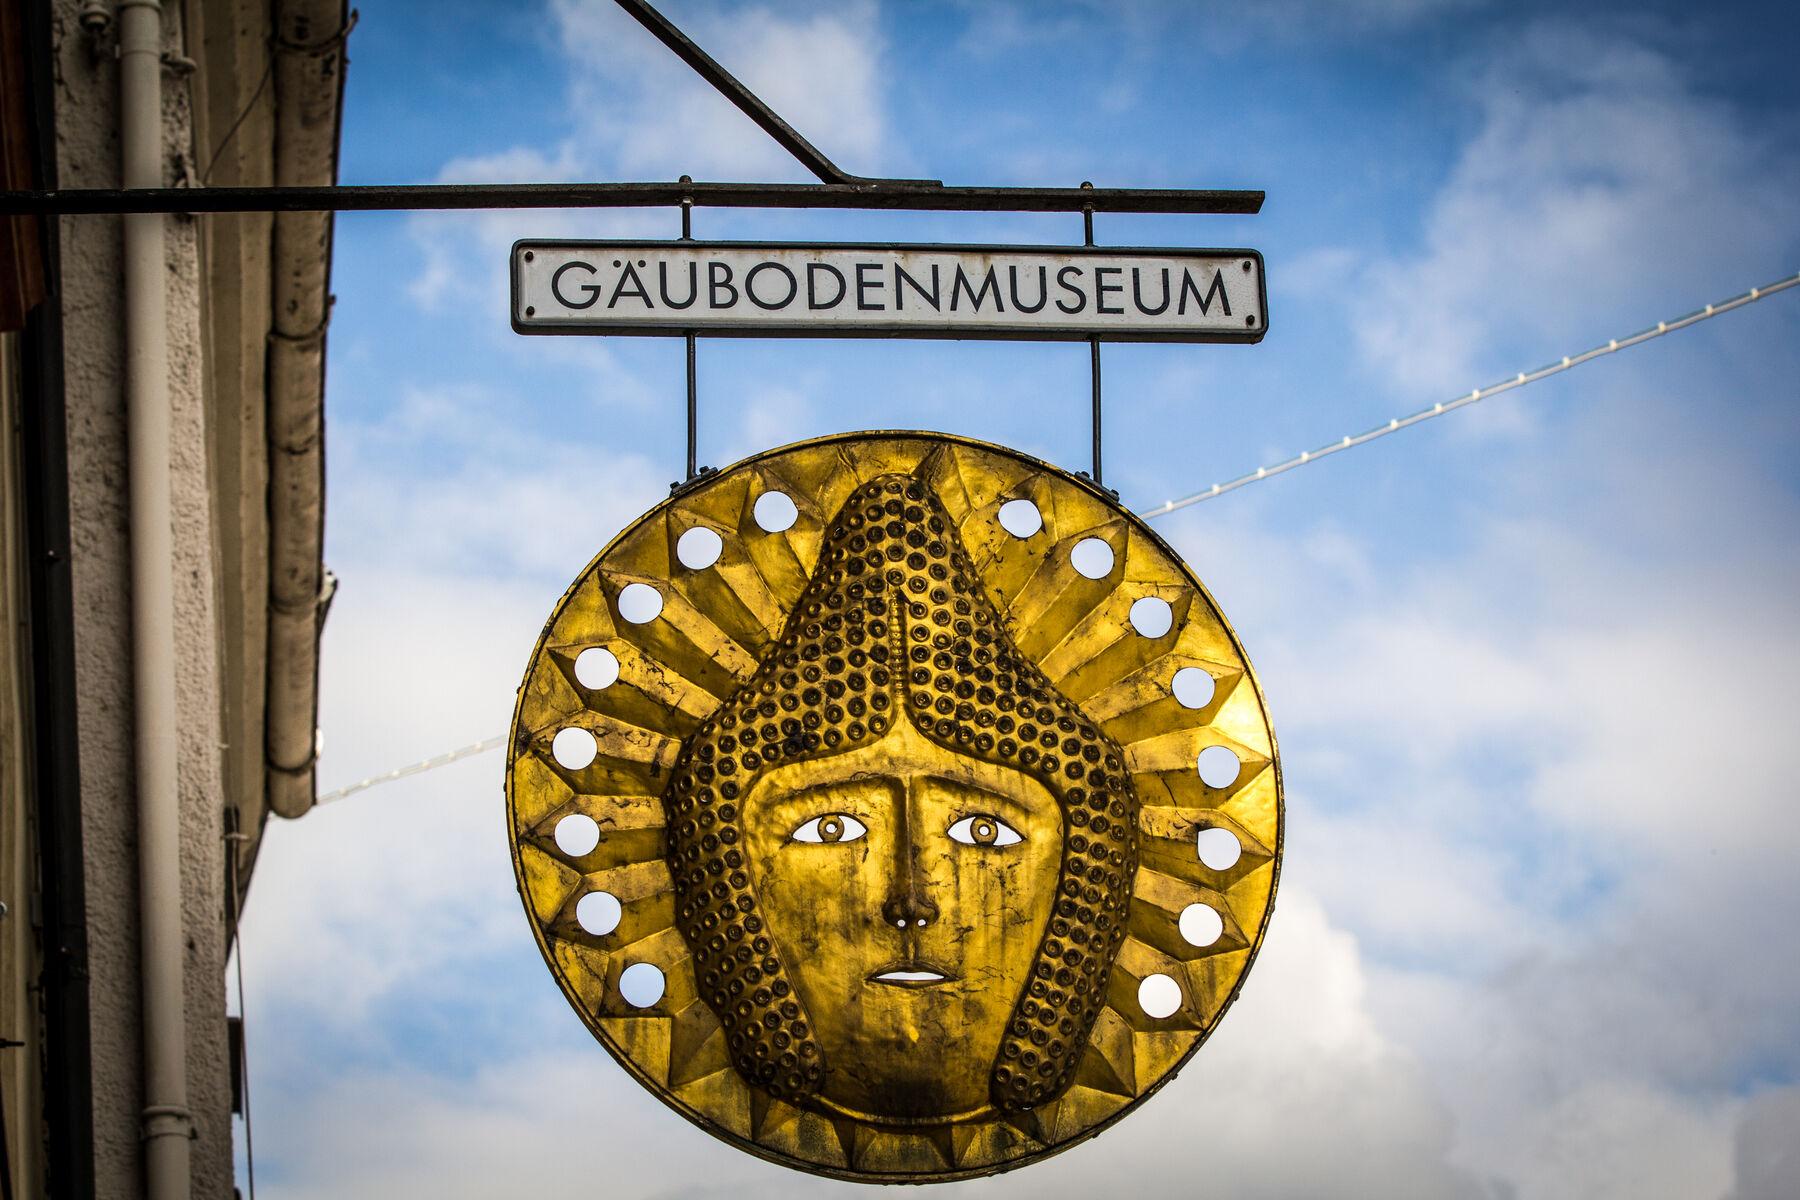 Gäubodenmuseum